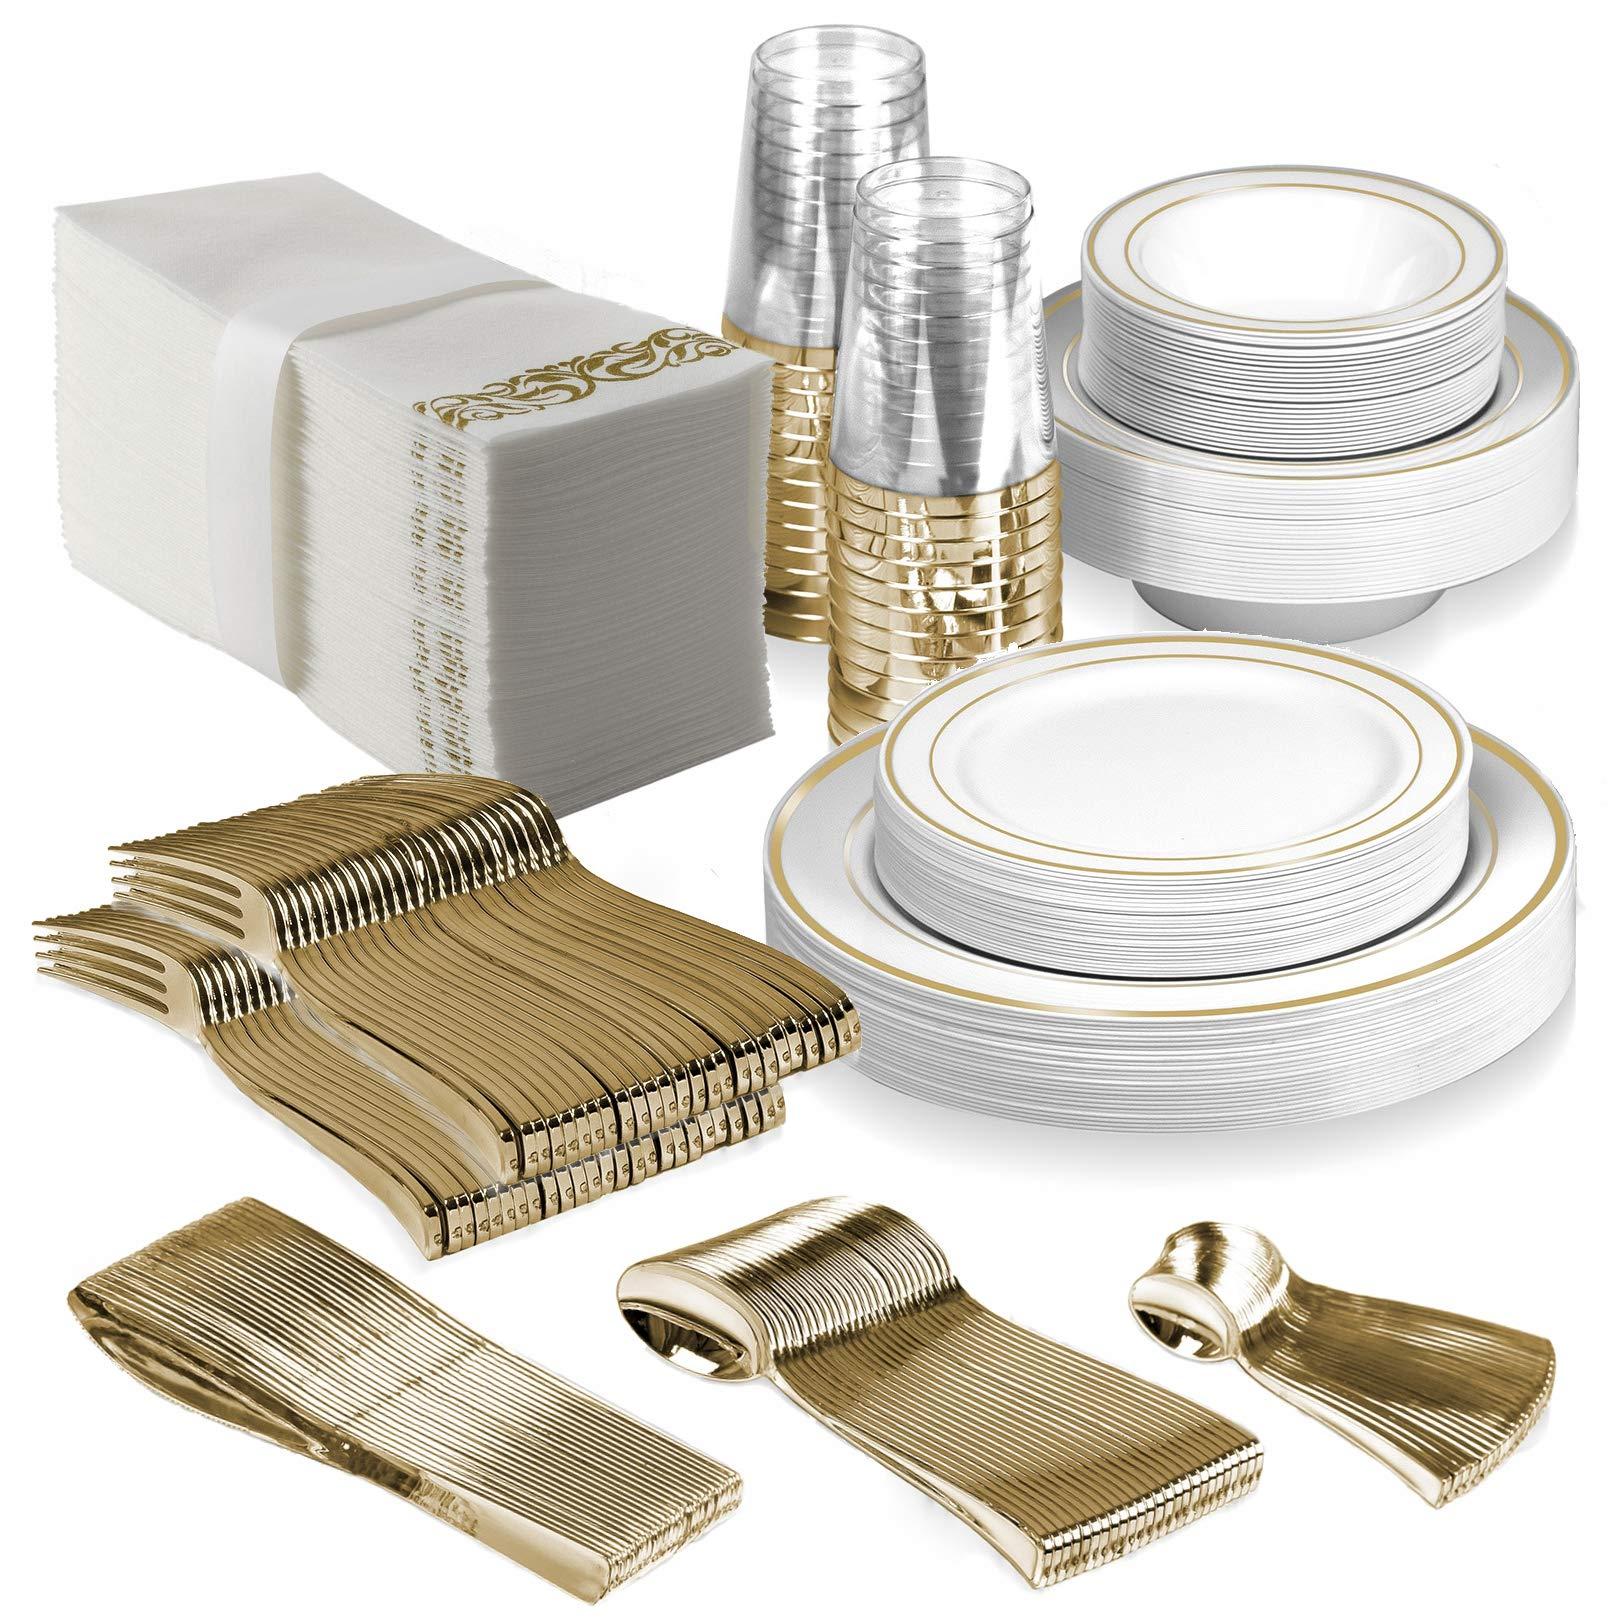 25 Guest Disposable Gold Dinnerware Set | Heavy Duty Plastic Plates, Cups, Silverware & Napkins. 50 Forks, 25 Spoons, 25 Dessert Spoons, 25 Knives, 25 Dinner Plates, 25 Dessert Plates, 25 Soup Bowls